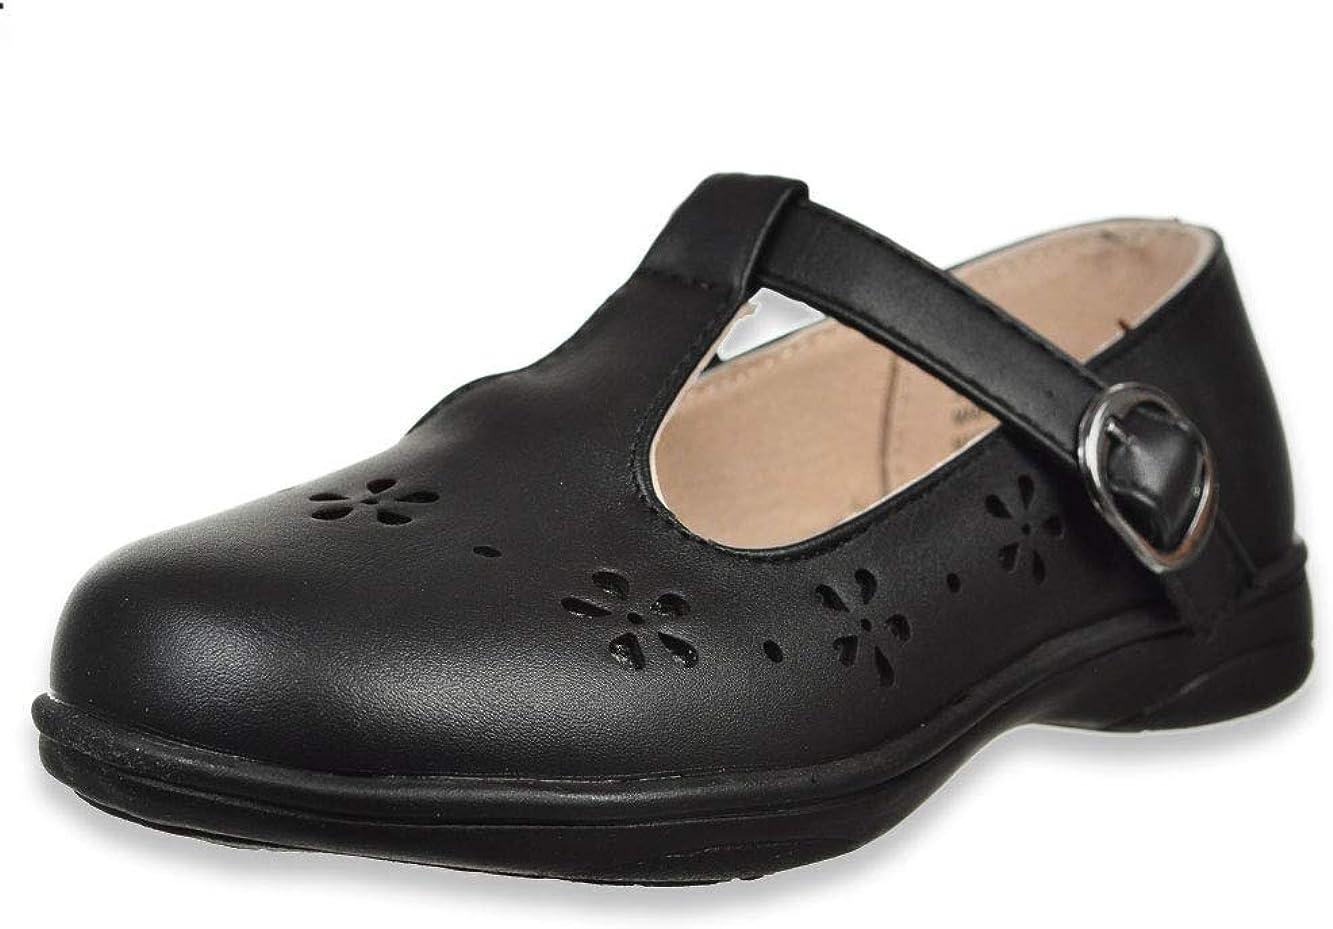 Laura Ashley Girls' T-Strap Mary Jane Shoes